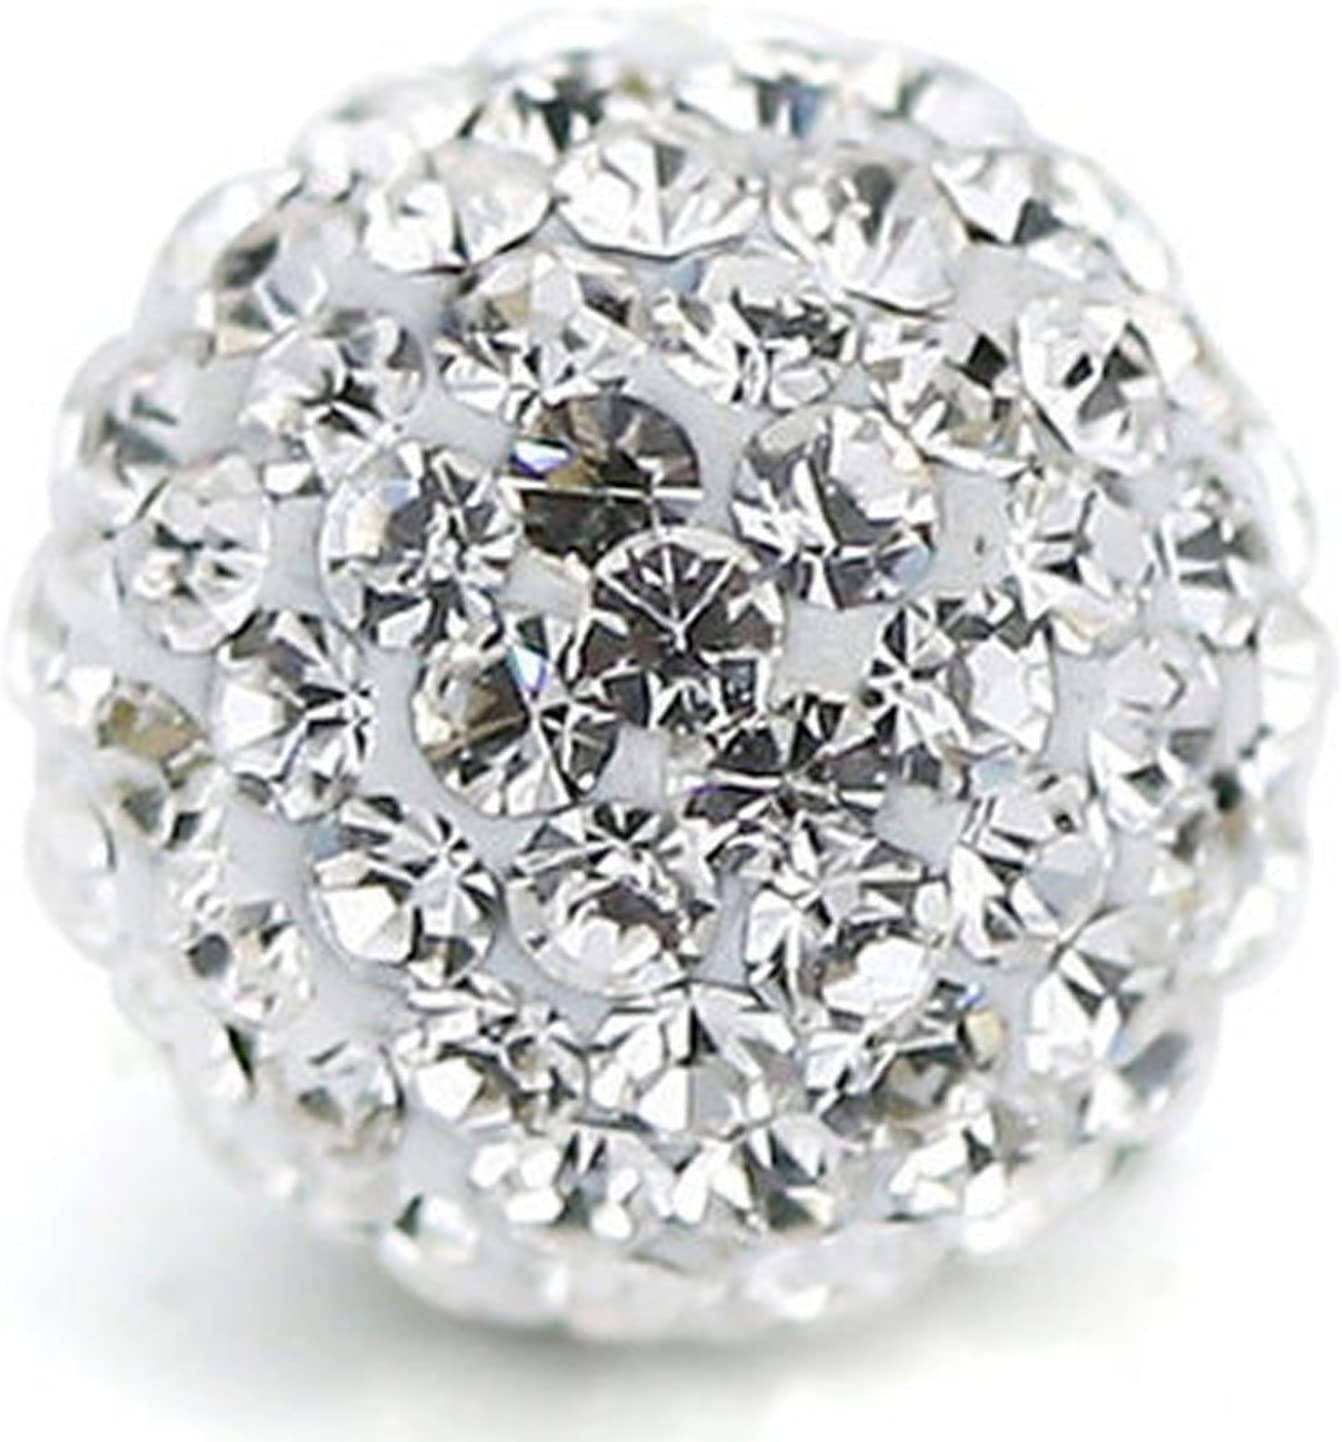 RUBYCA Pave Czech Crystal Disco Ball Clay Beads fit Shamballa Jewelry (20pcs, 12mm, White Clear)